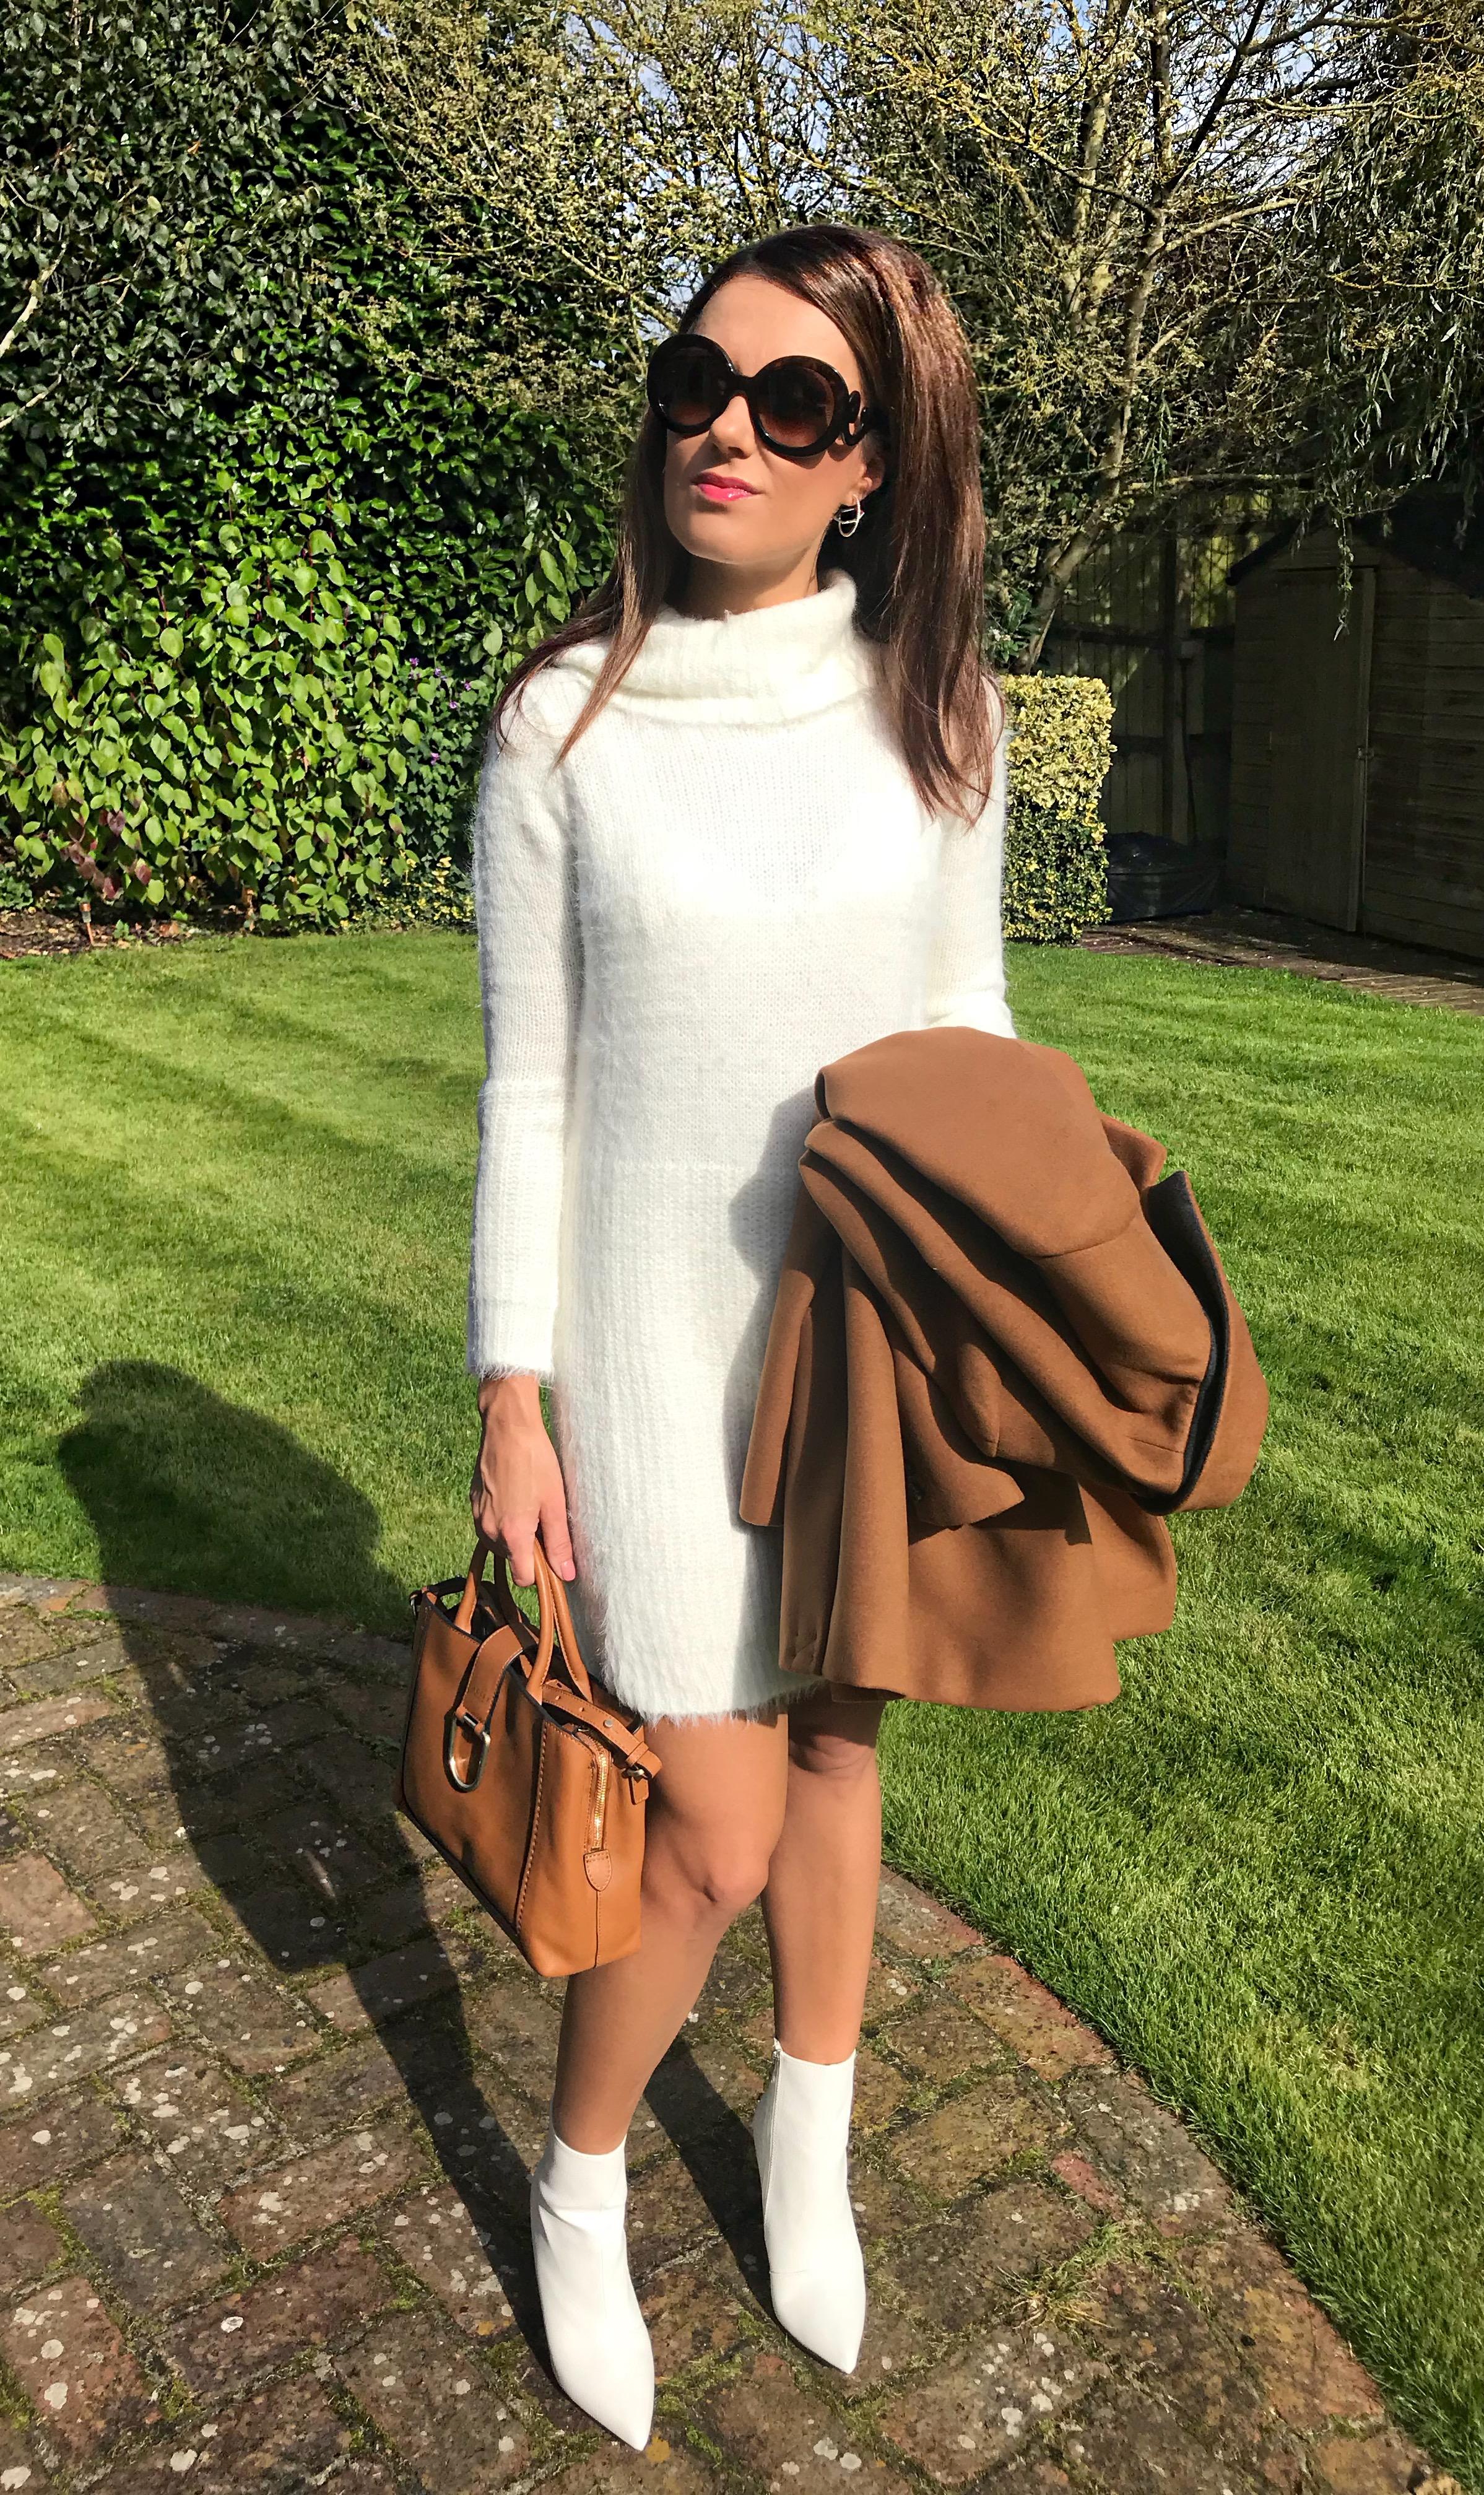 Warehouse Double Breasted Tailored Coat QED London Oversized Roll Neck Jumper Dress |Public Desire Harlee White Pointed Ankle Boots | Radley Bag | Swarovski hoop earrings | Prada Baroque Earrings